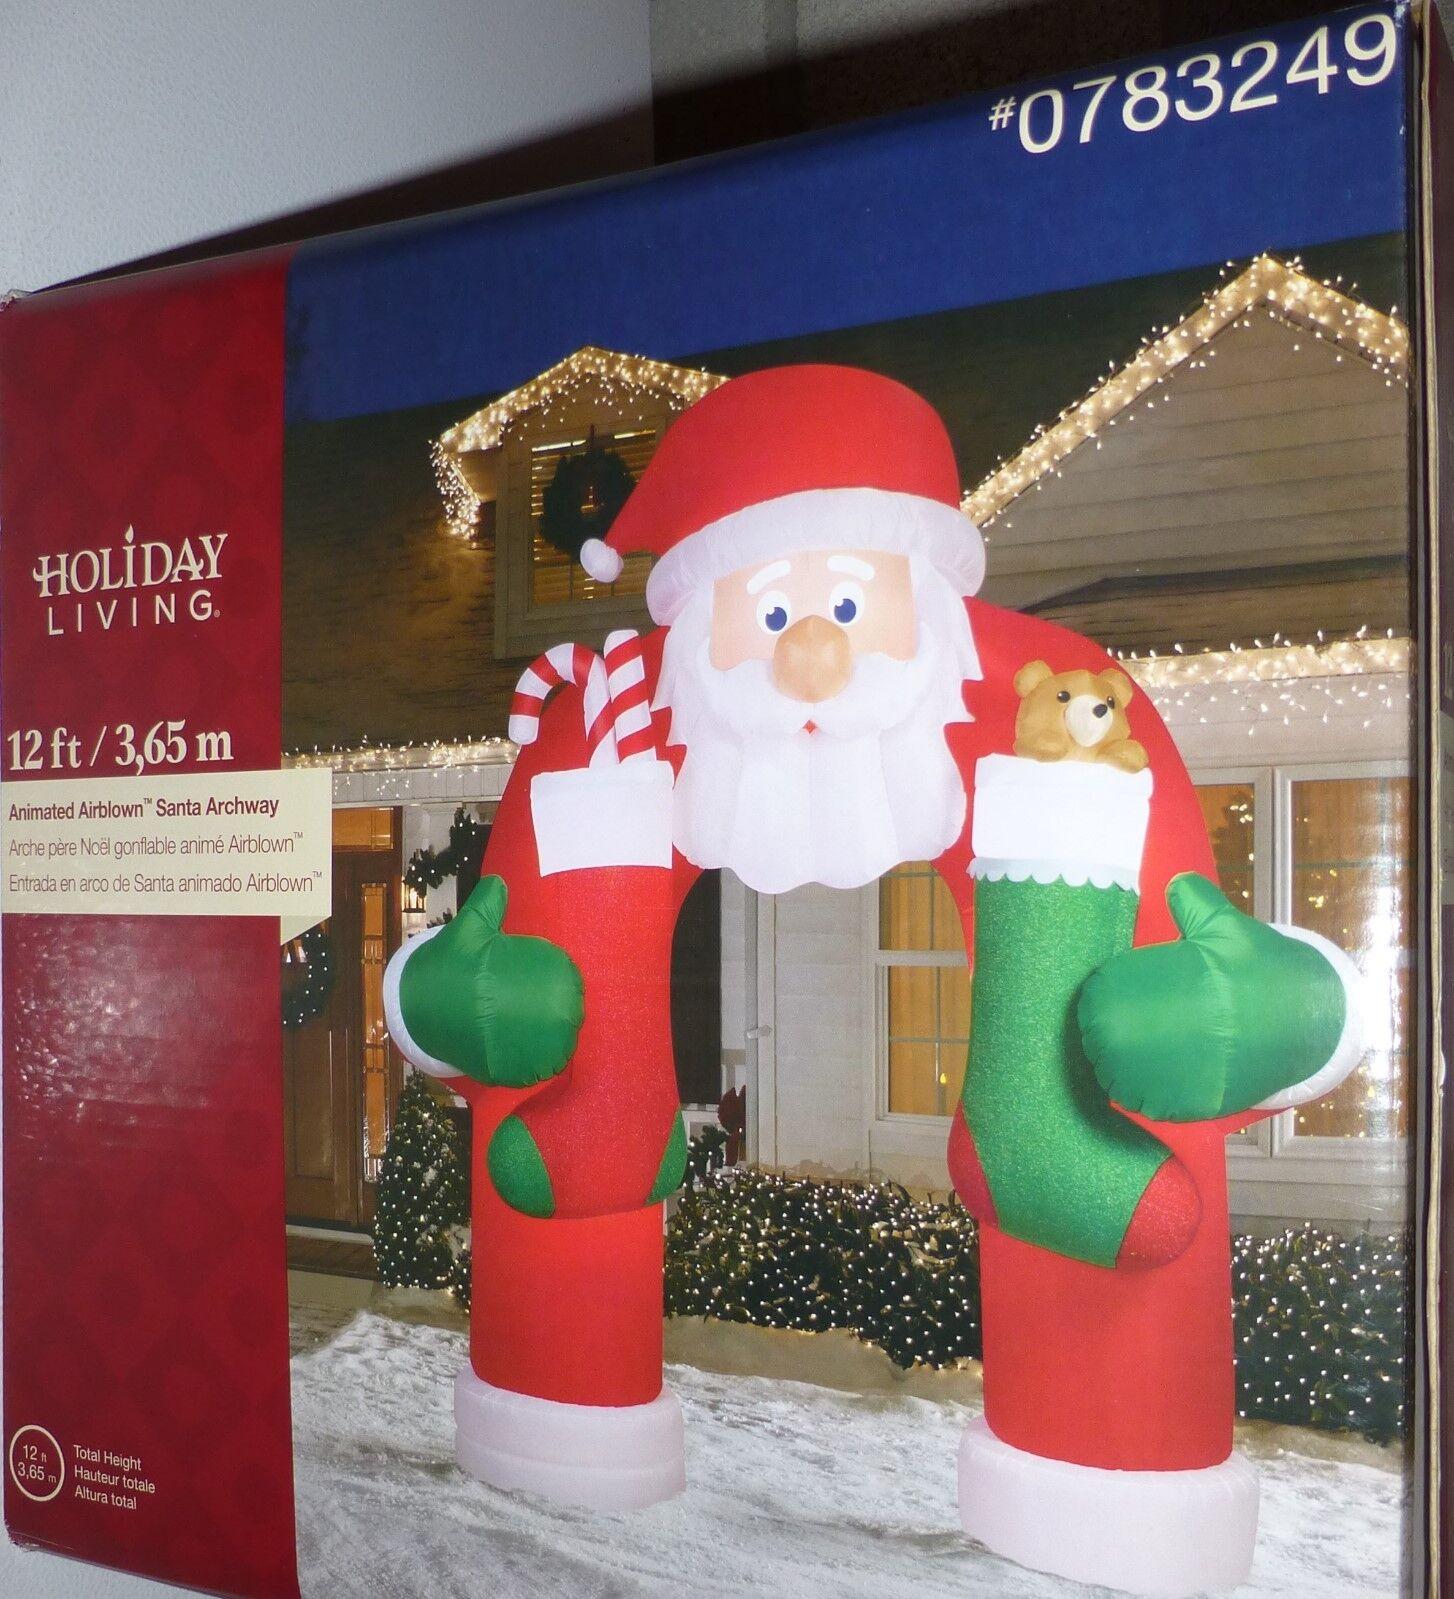 12ft Tall Animated Santa Archway Christmas Airblown Inflatable Yard Decor